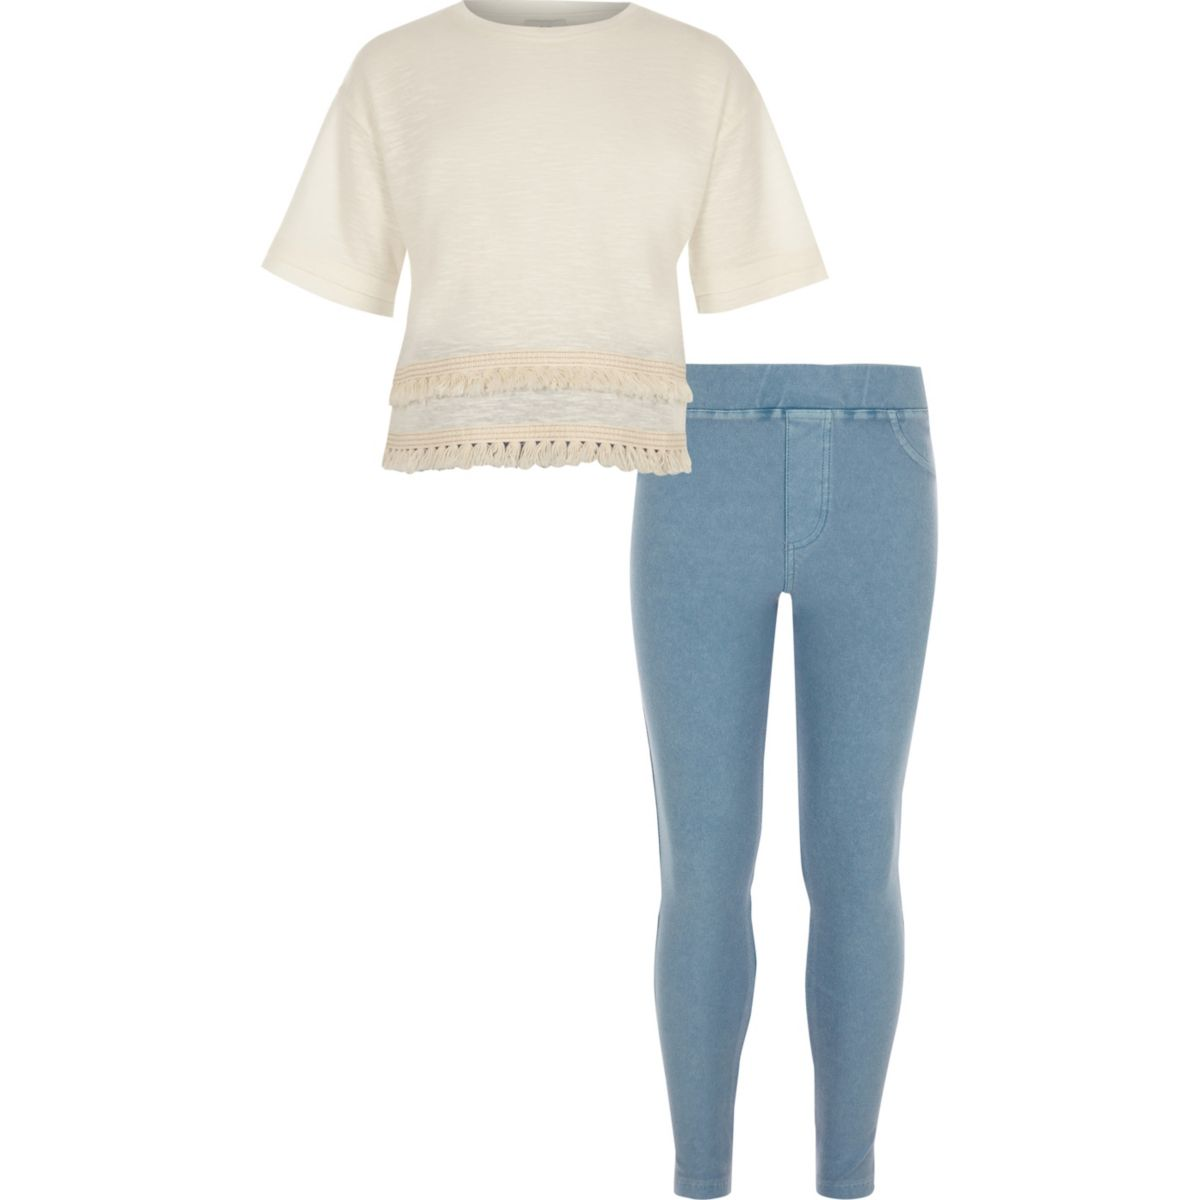 Girls cream T-shirt and denim leggings outfit